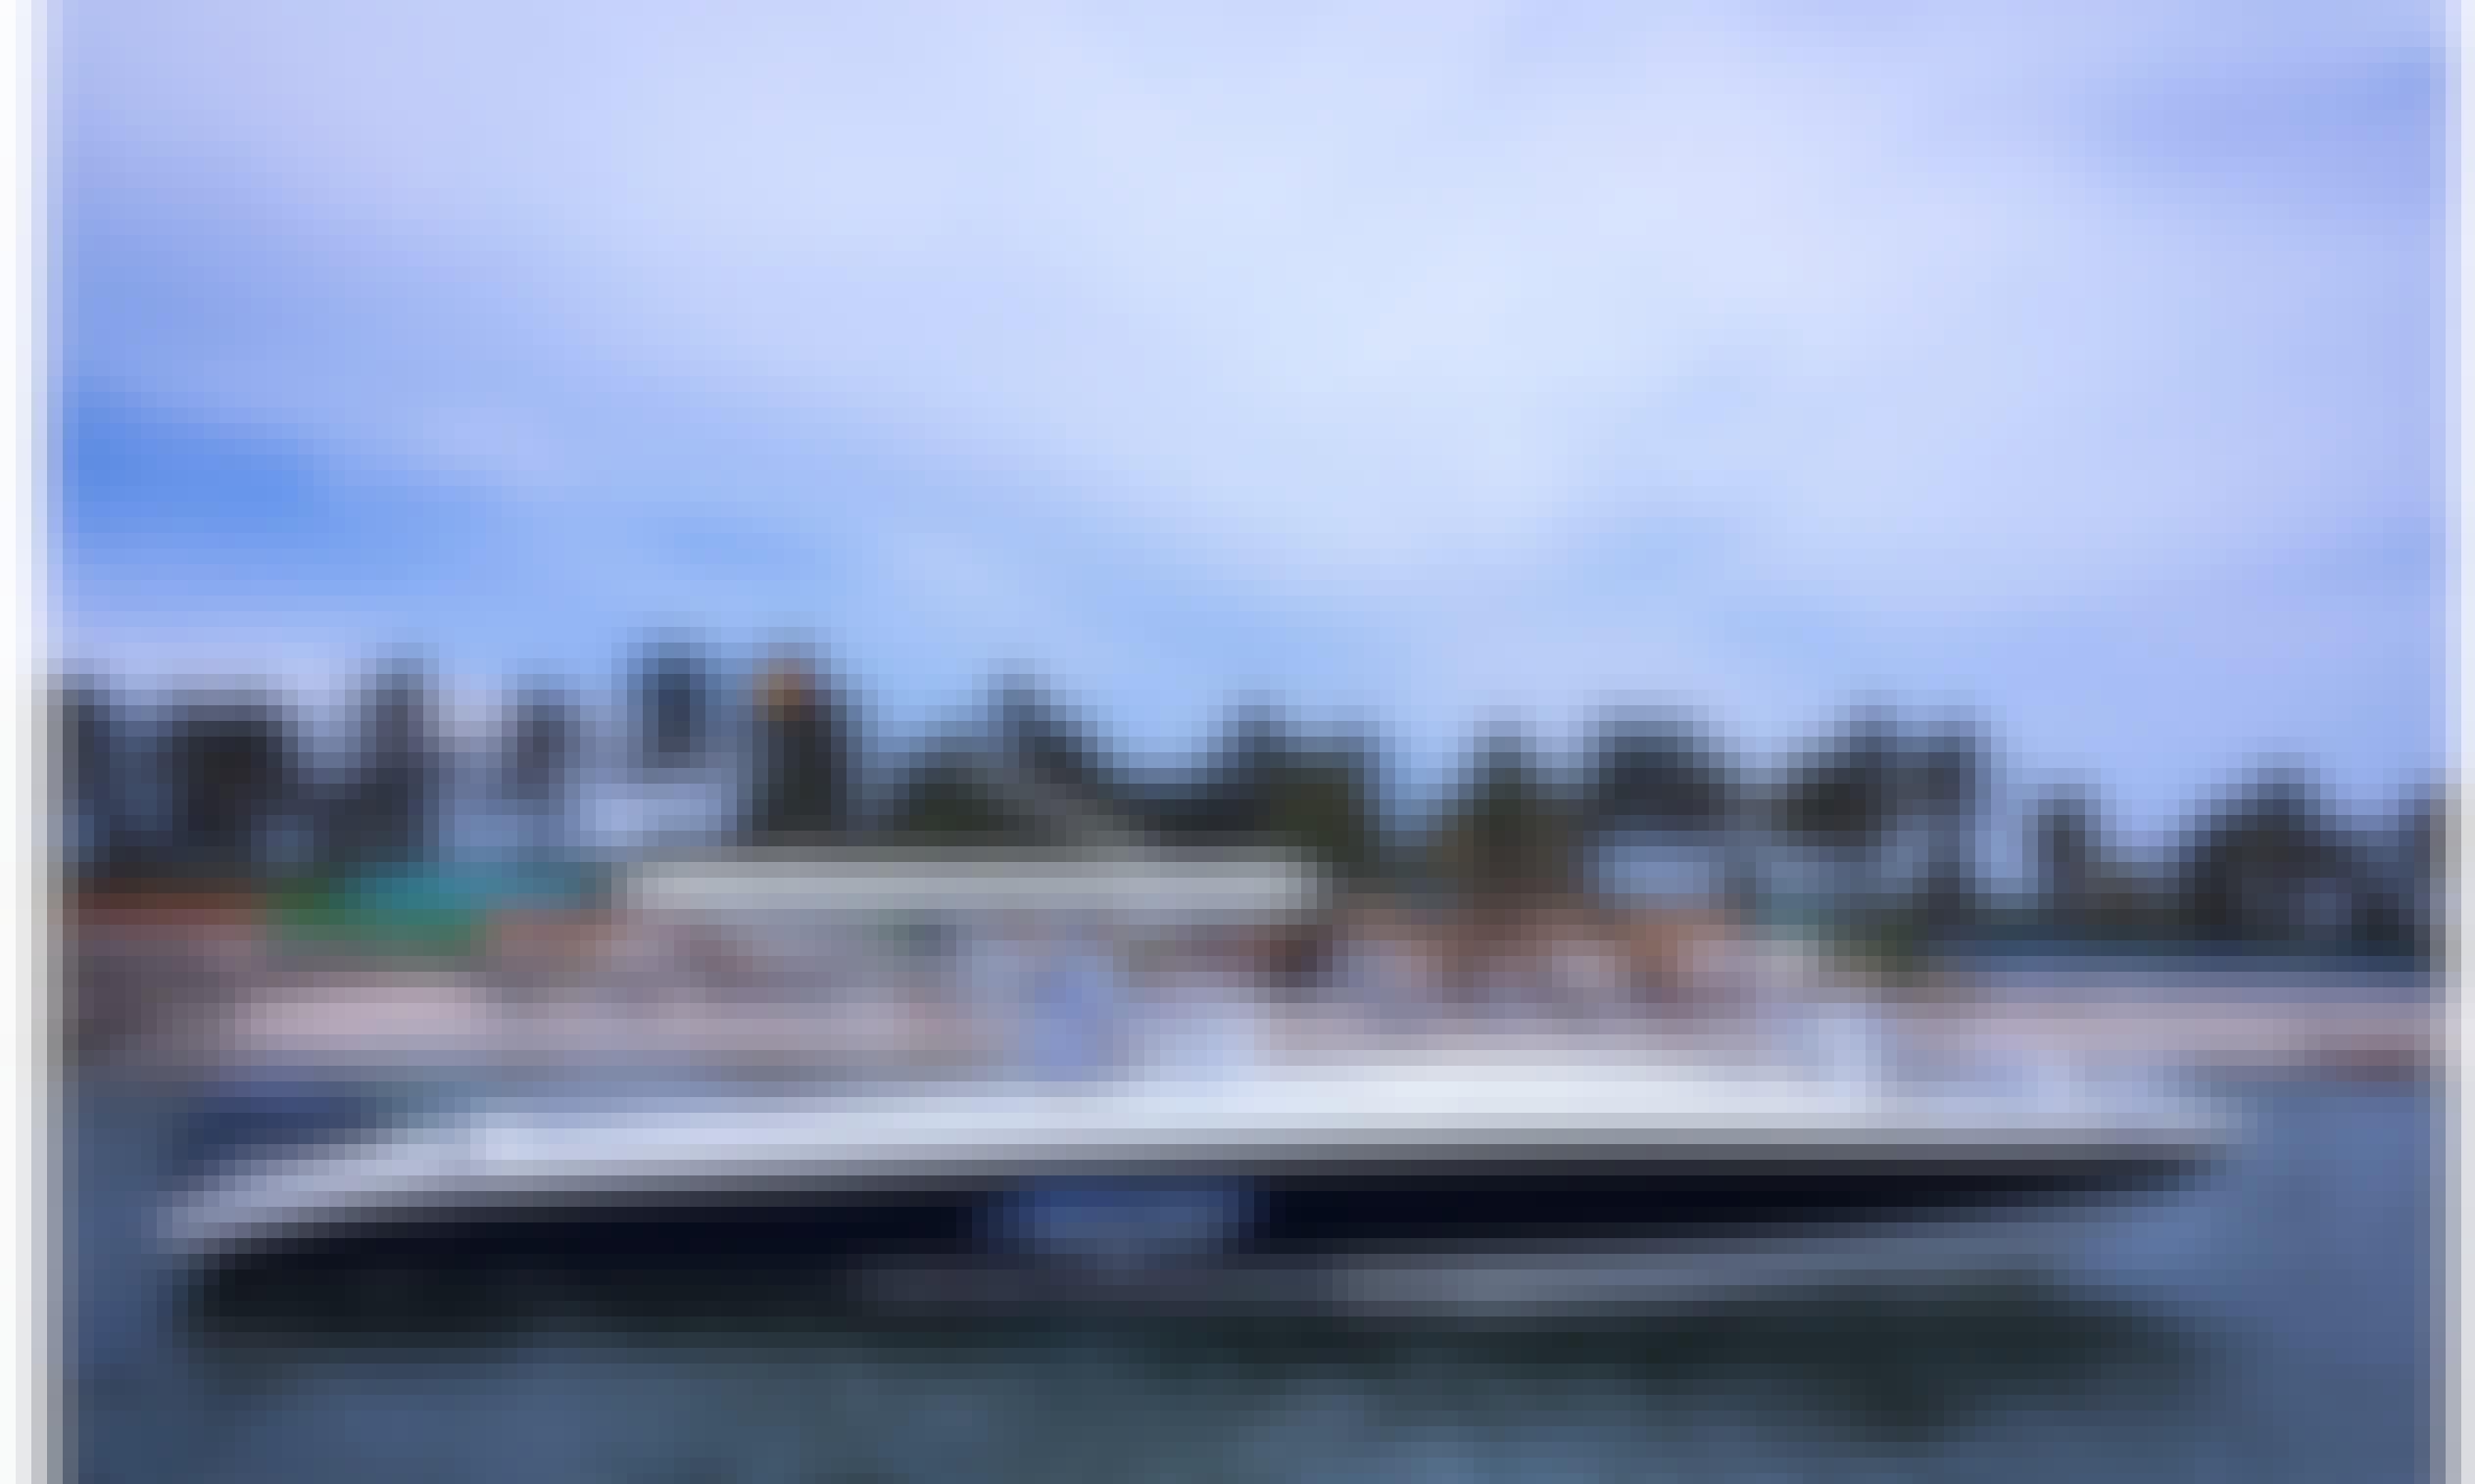 Boat Rental 42ft Capacity 20 people in Cartagena, Bolívar